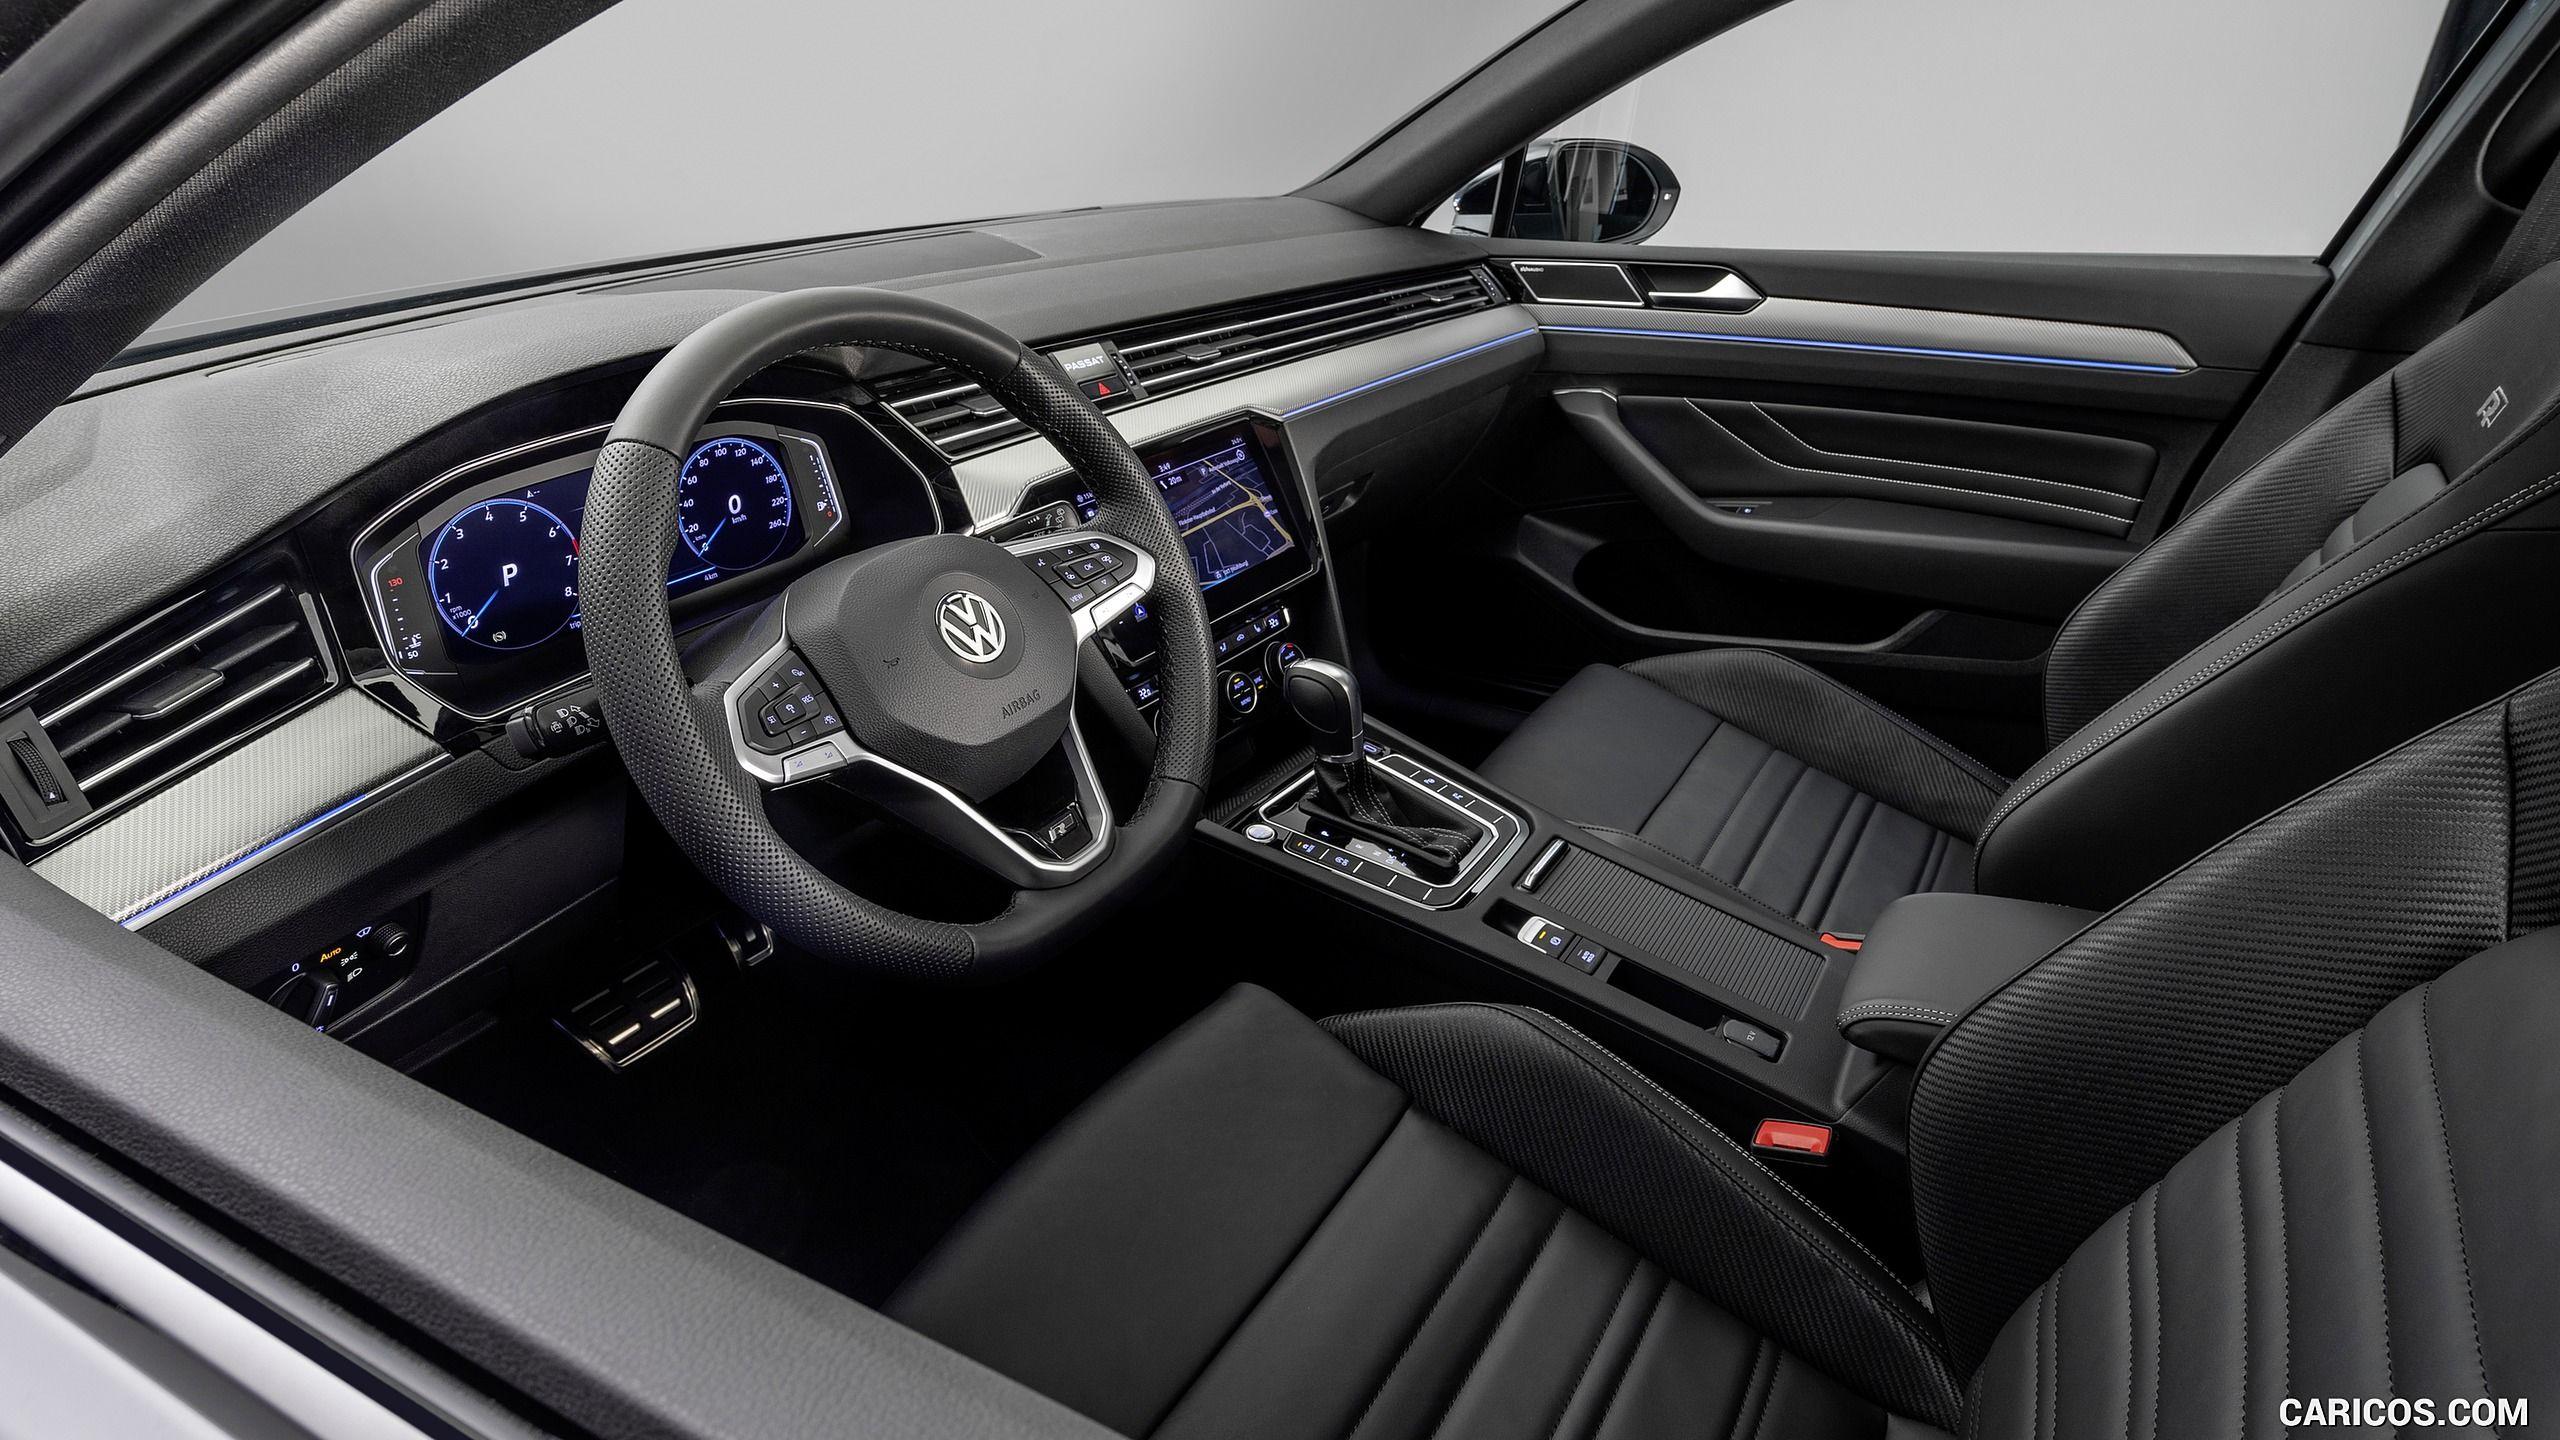 2019 Volkswagen Passat Variant R Line Edition Eu Spec Interior Hd Volkswagen Passat Volkswagen Vw Passat